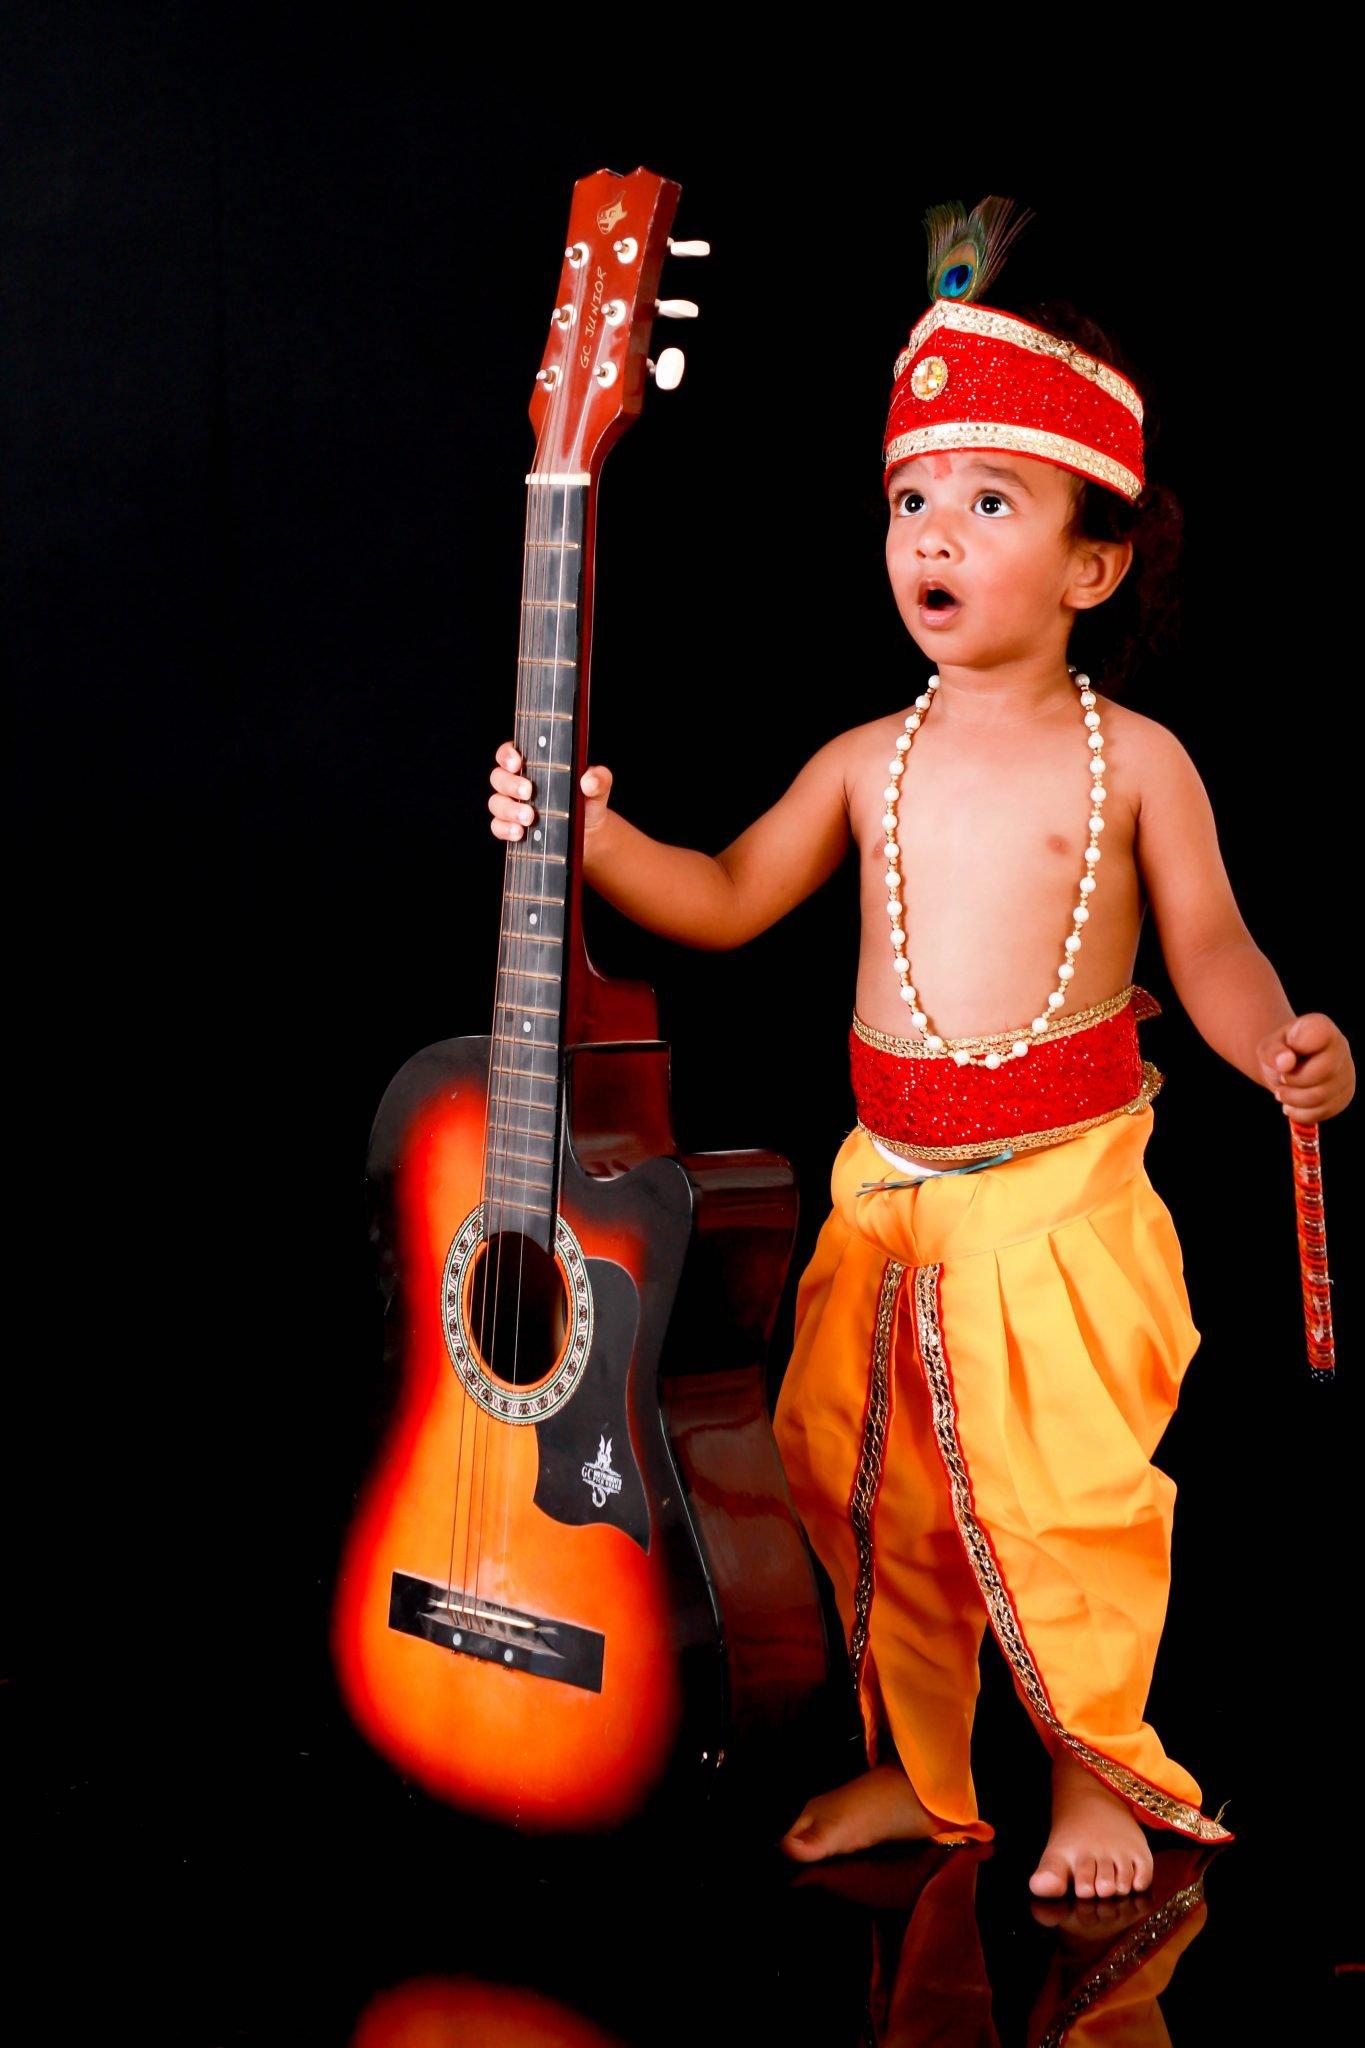 kids photoshoot kids photography baby boy photoshoot pre birthday photoshoot studio